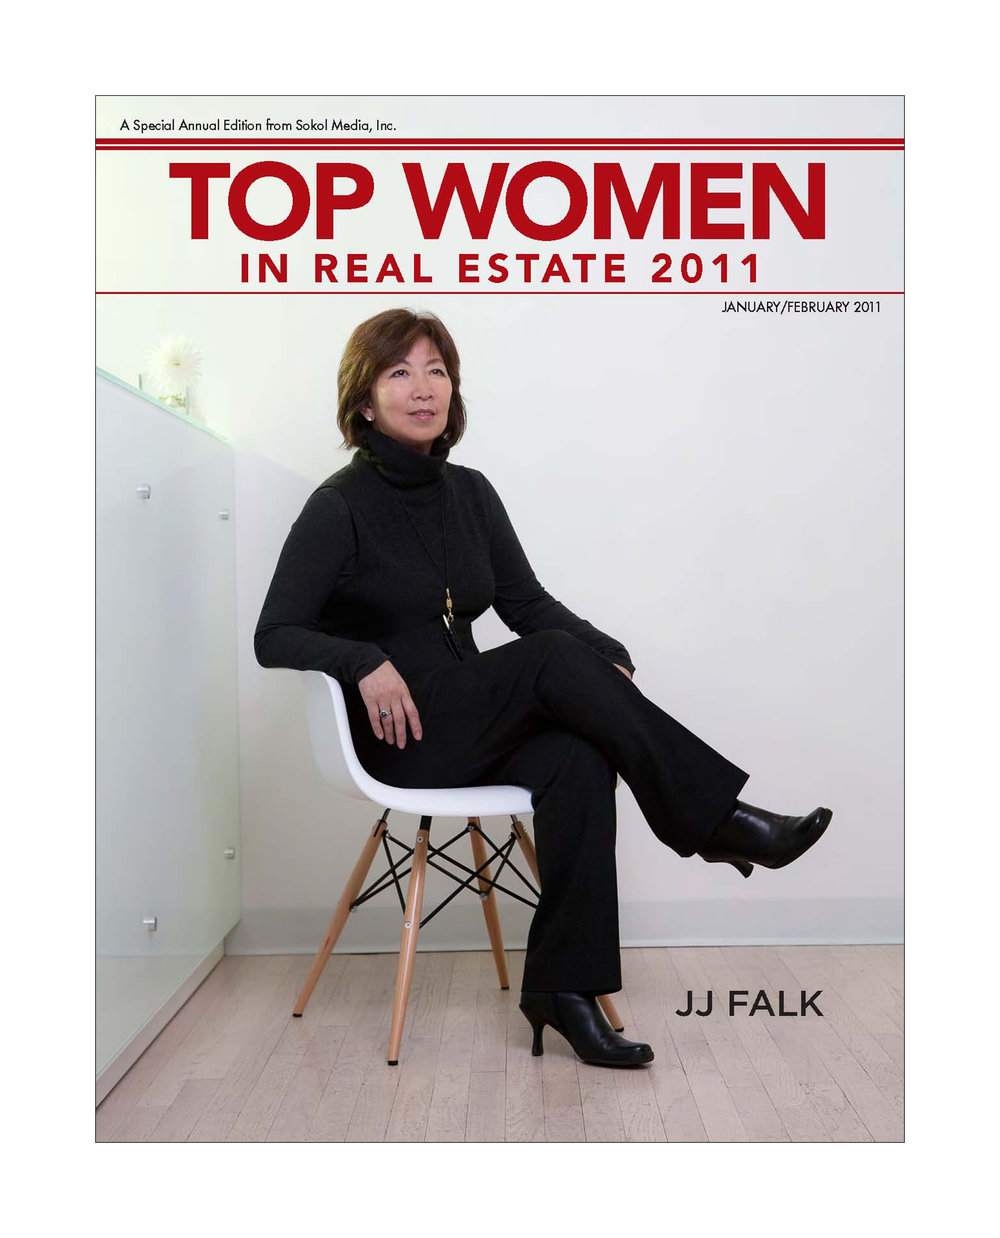 2011 Top Women in Real Estate